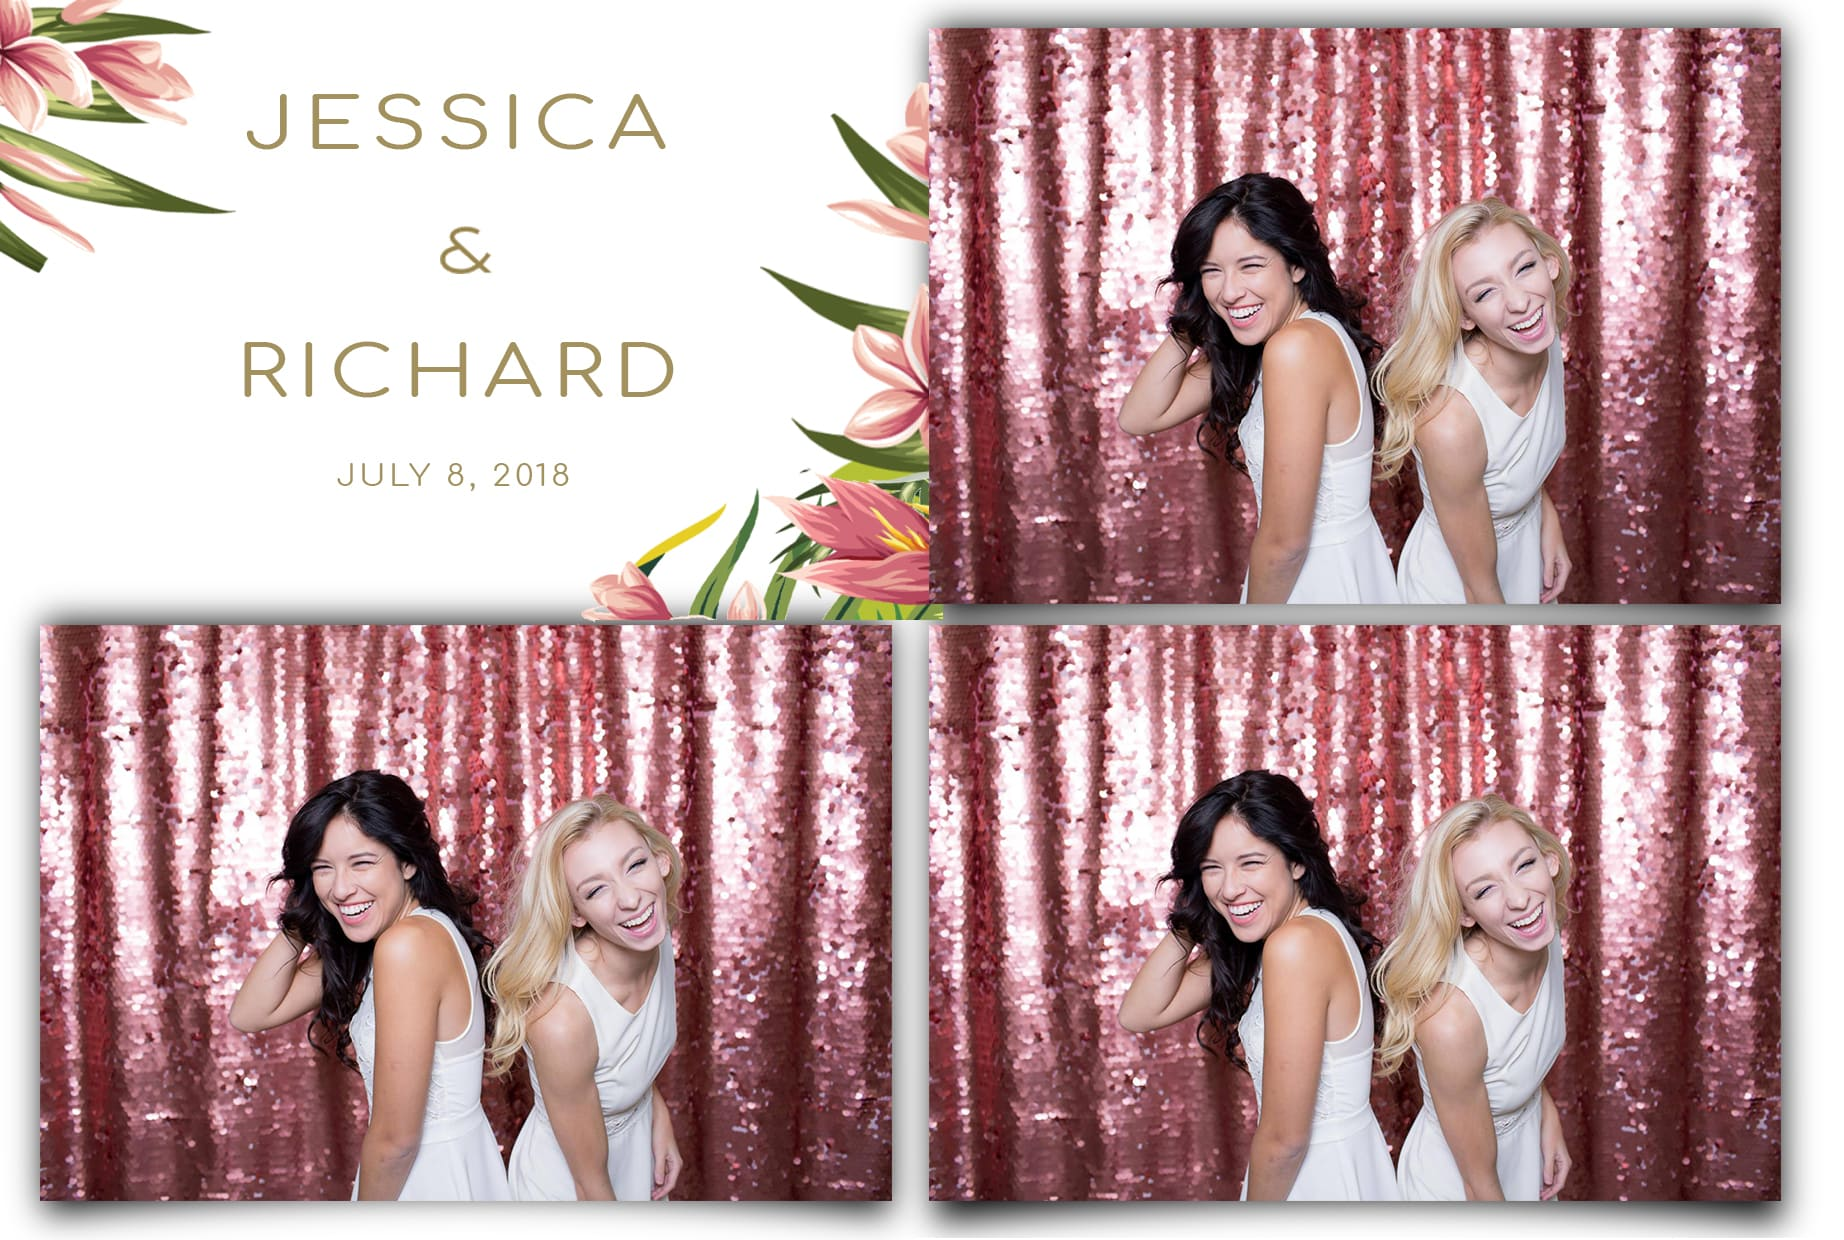 Jessica Sinkfield's WeddingDRAFT1-min.jpg